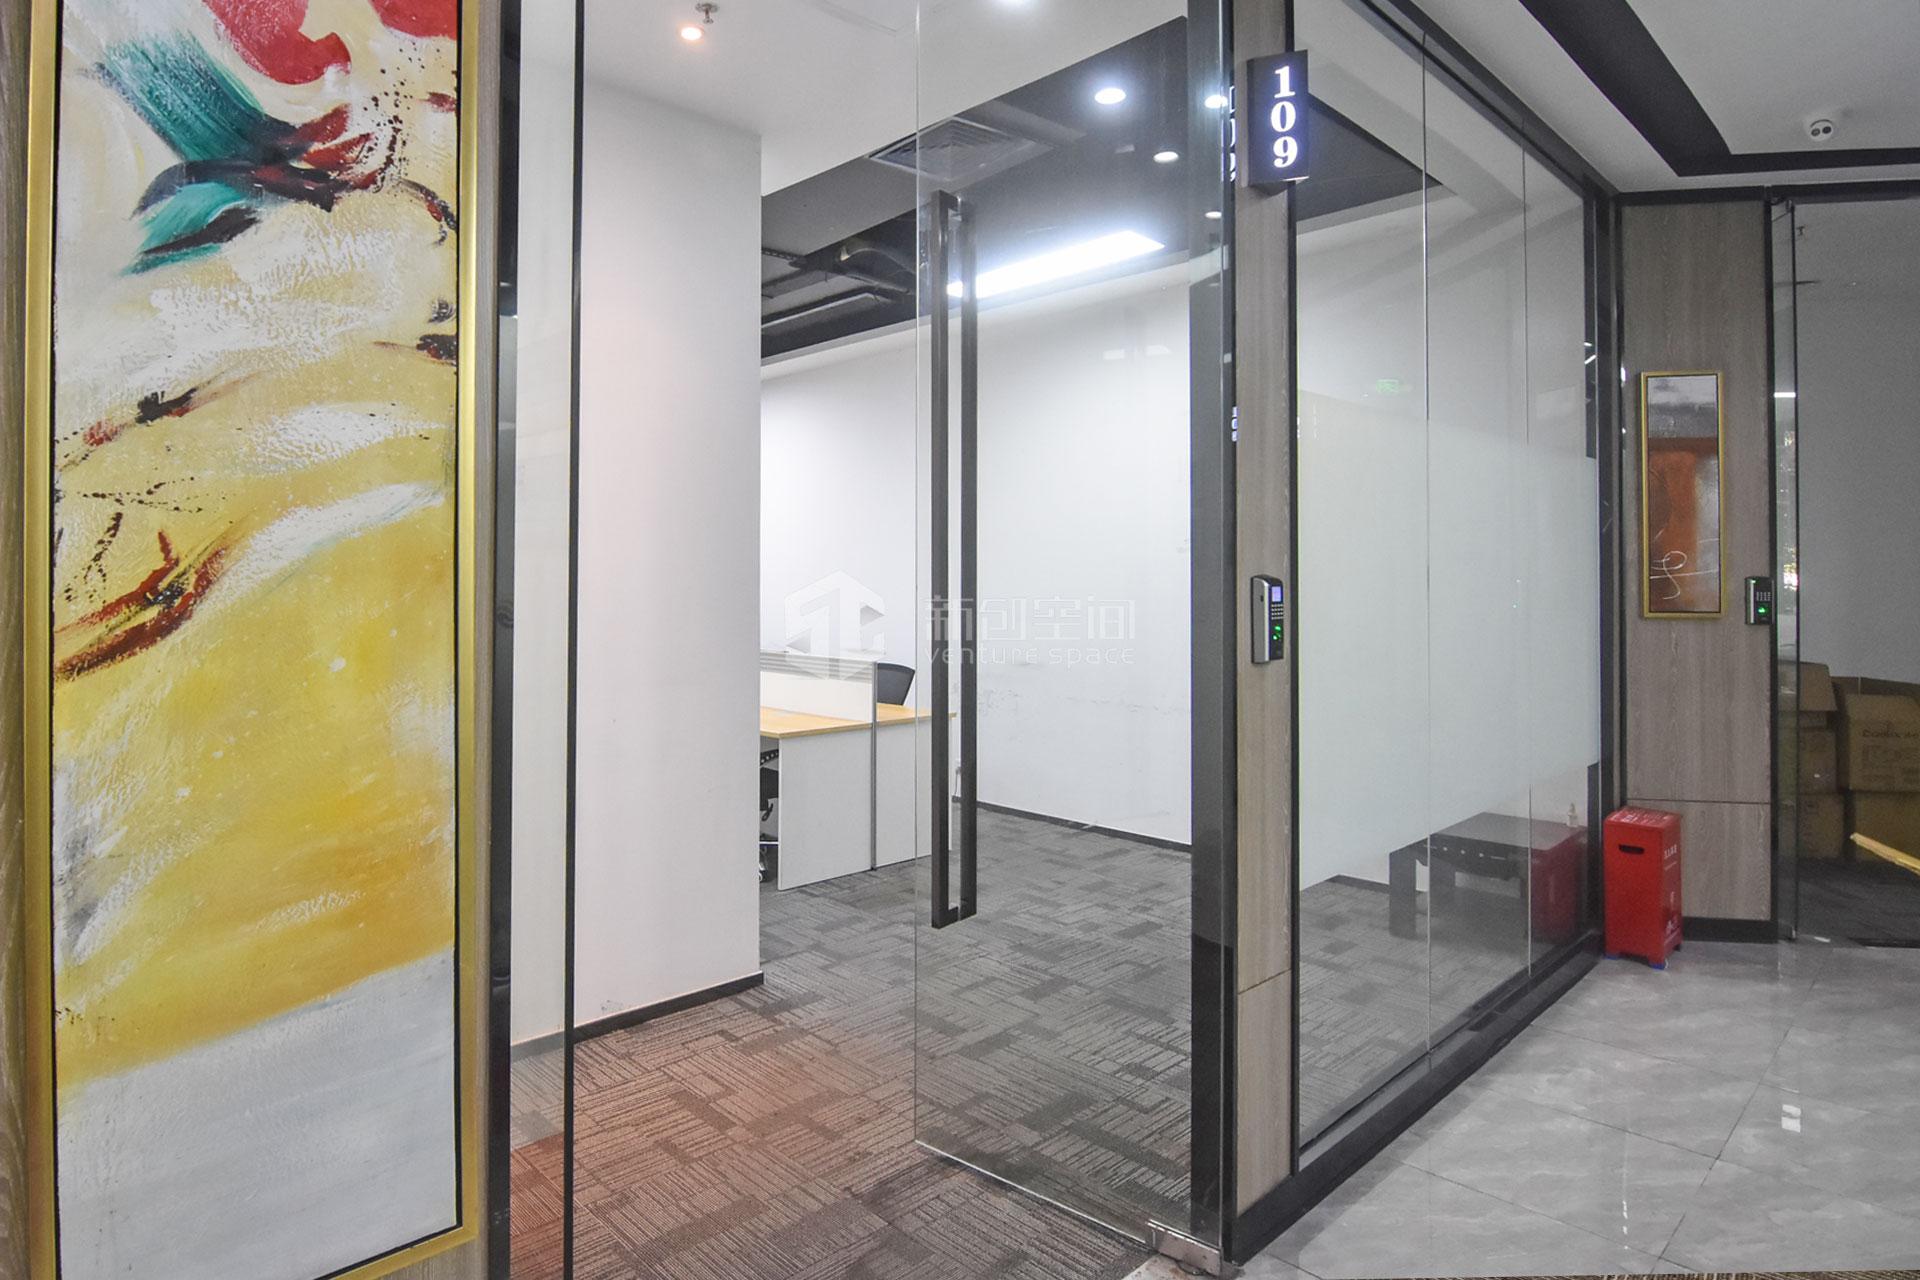 165m²·高新技术产业园